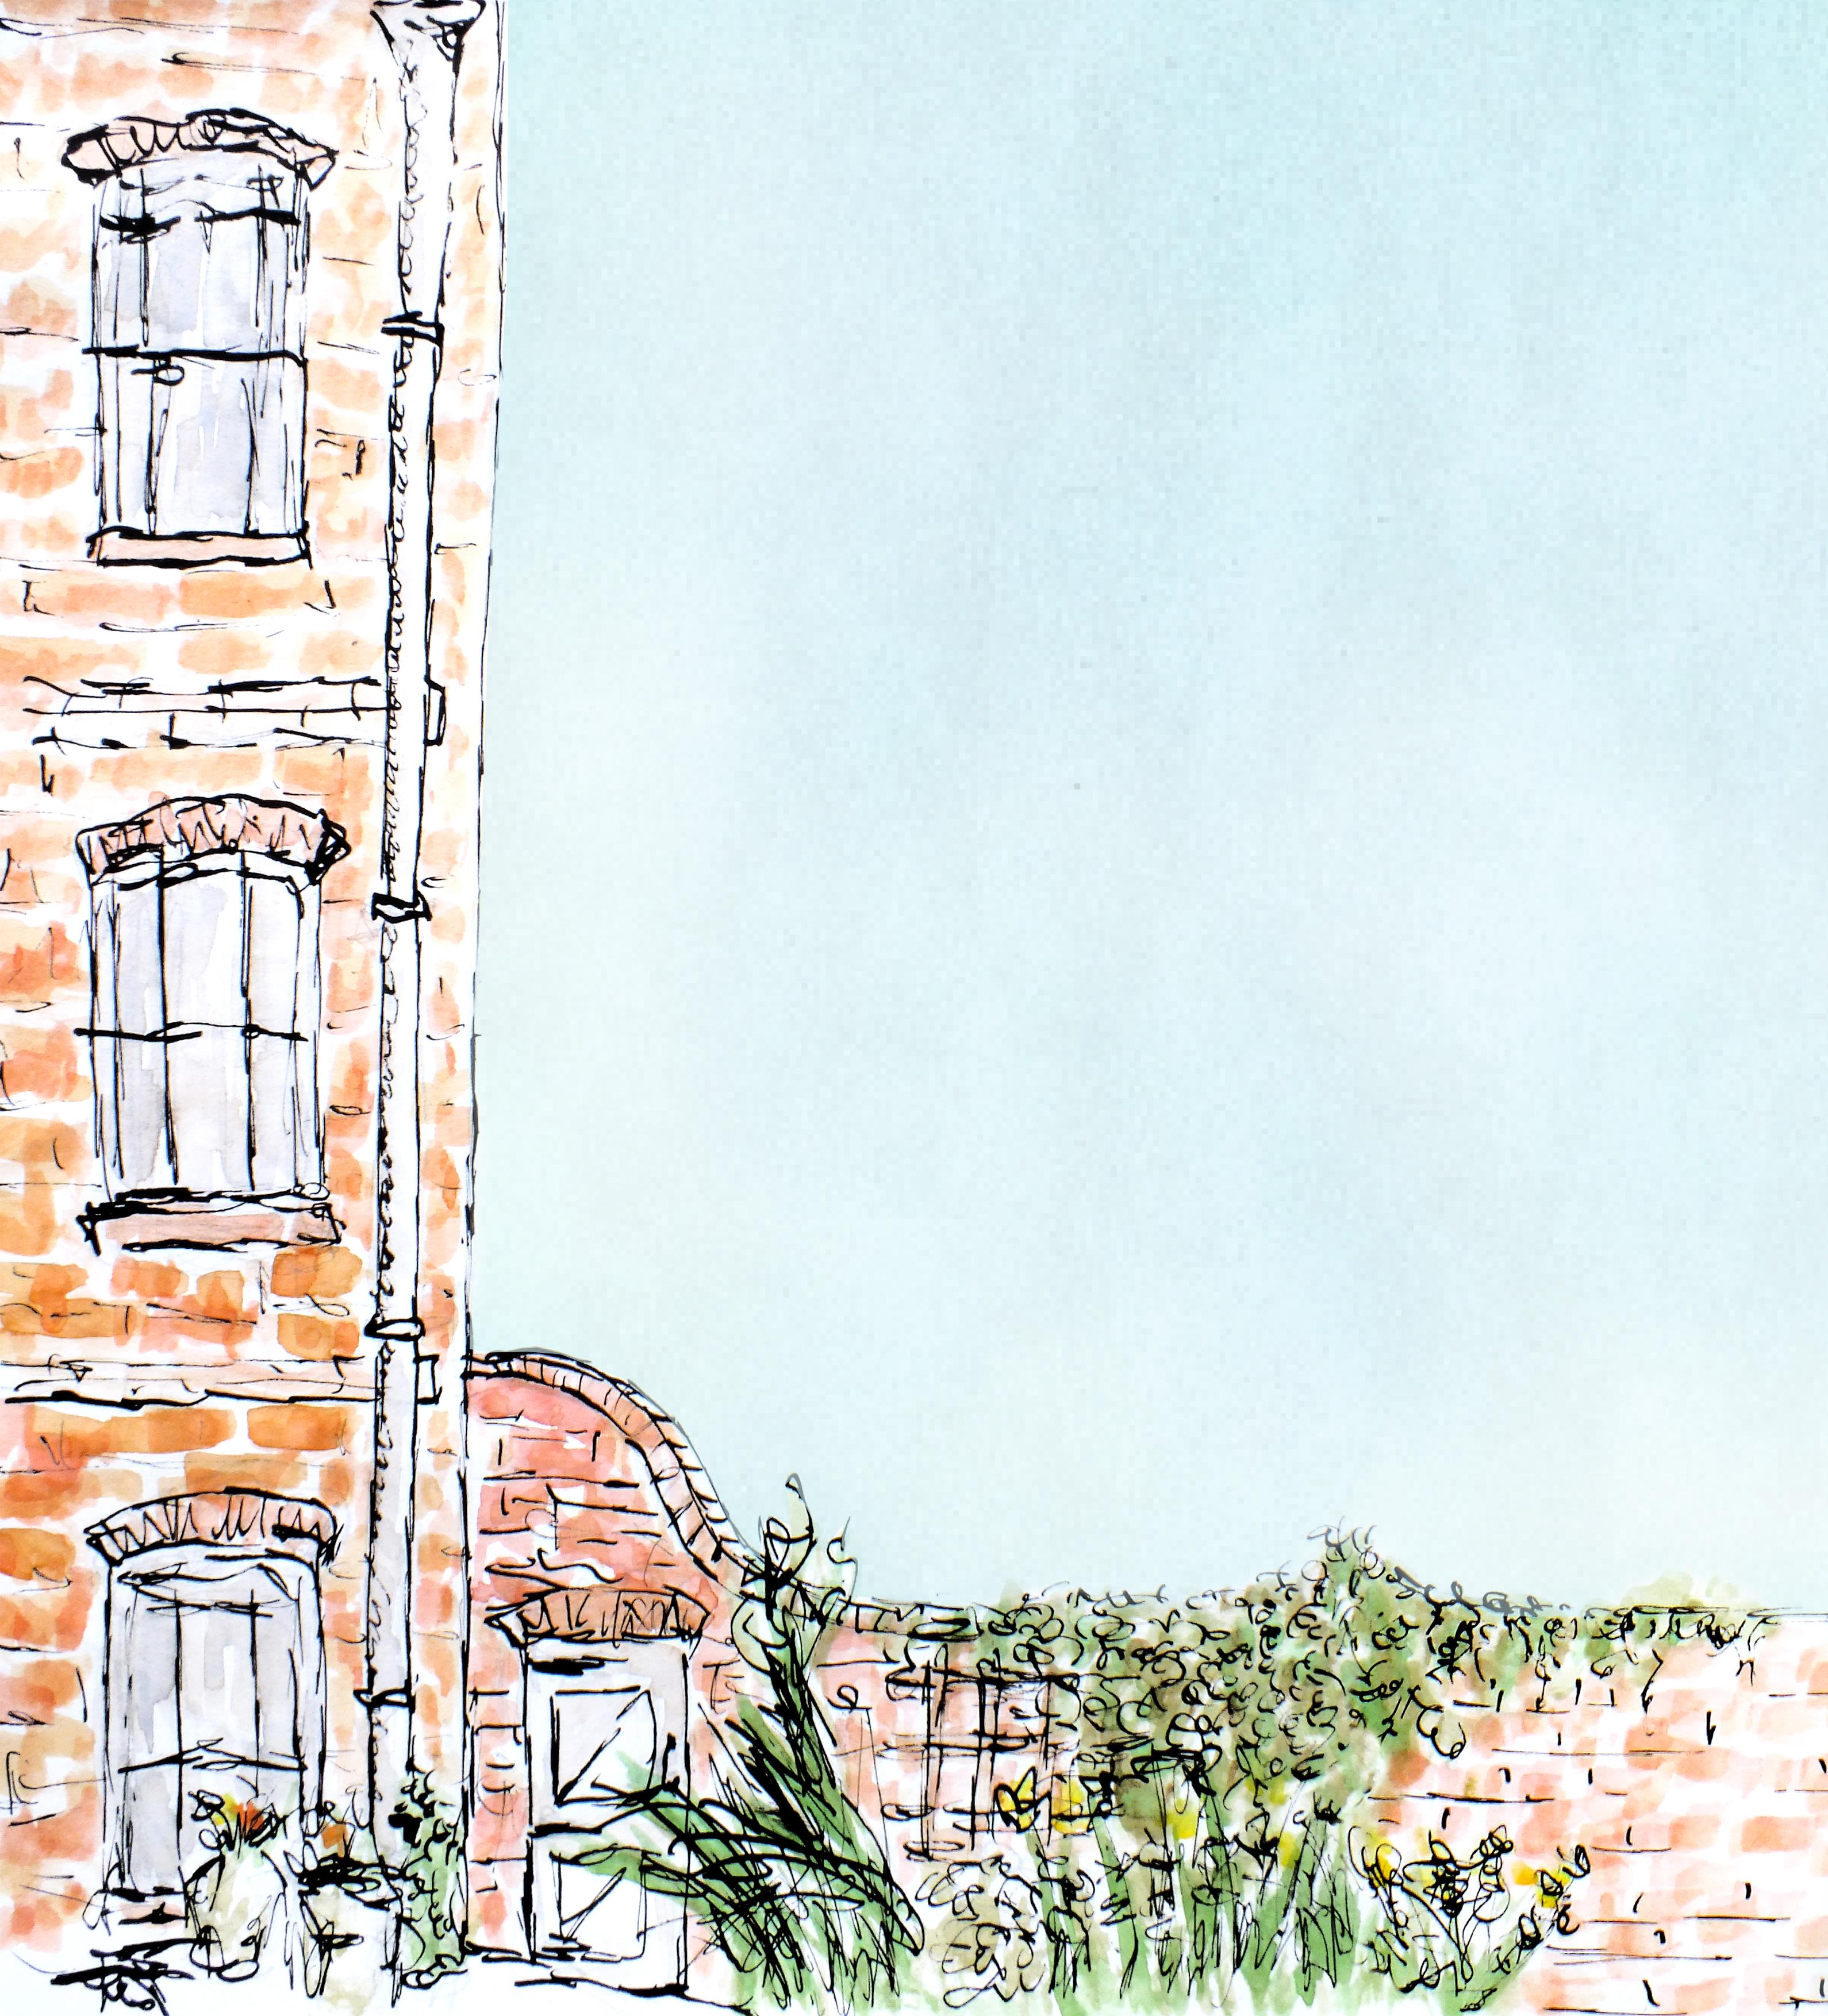 Claire Marchant - Museum of Farnham